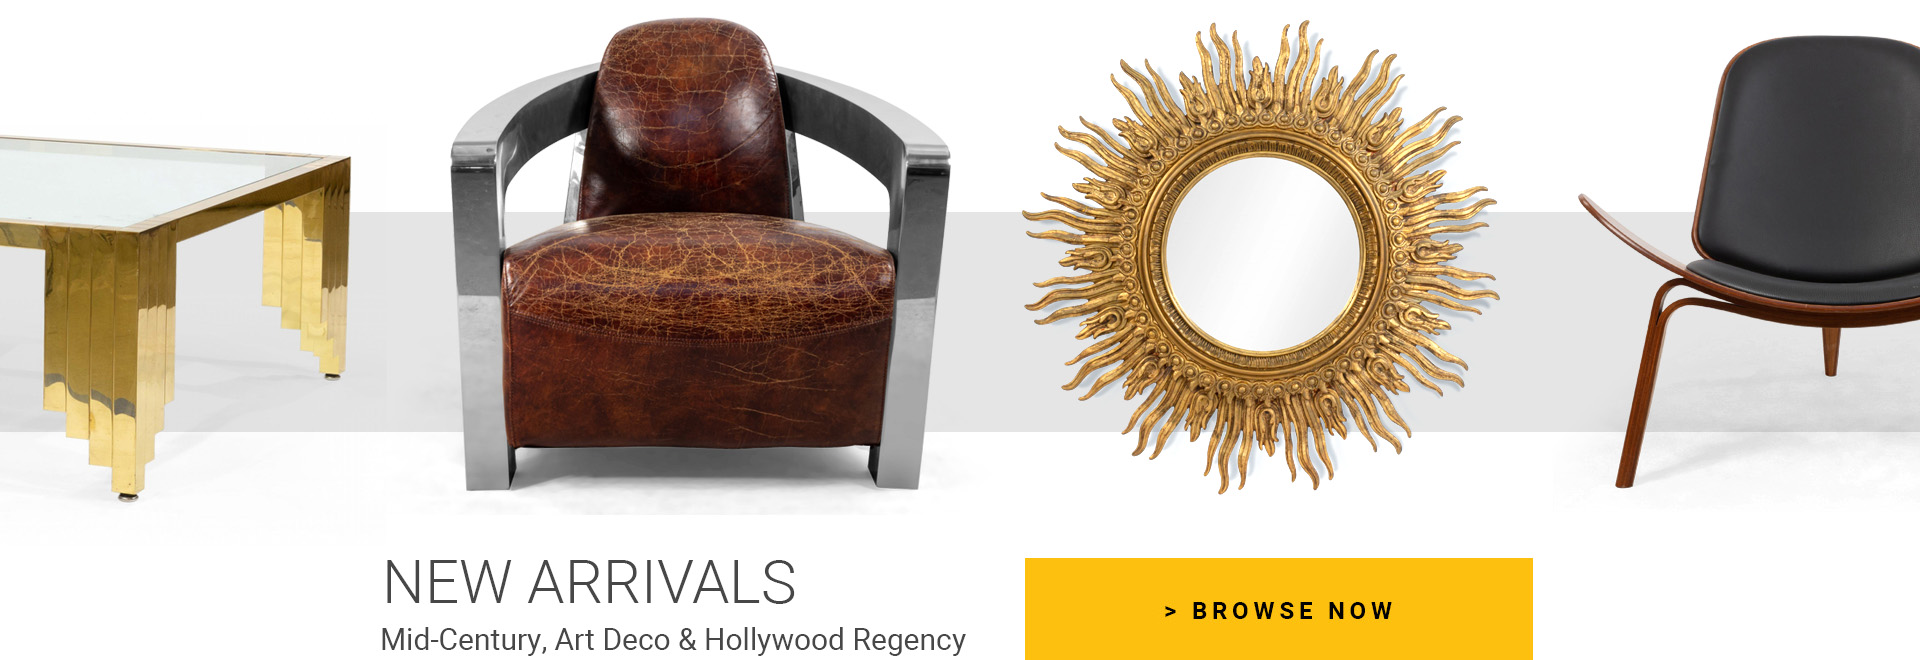 NEW ARRIVALS - Mid-Century, Art Deco & Hollywood Regency